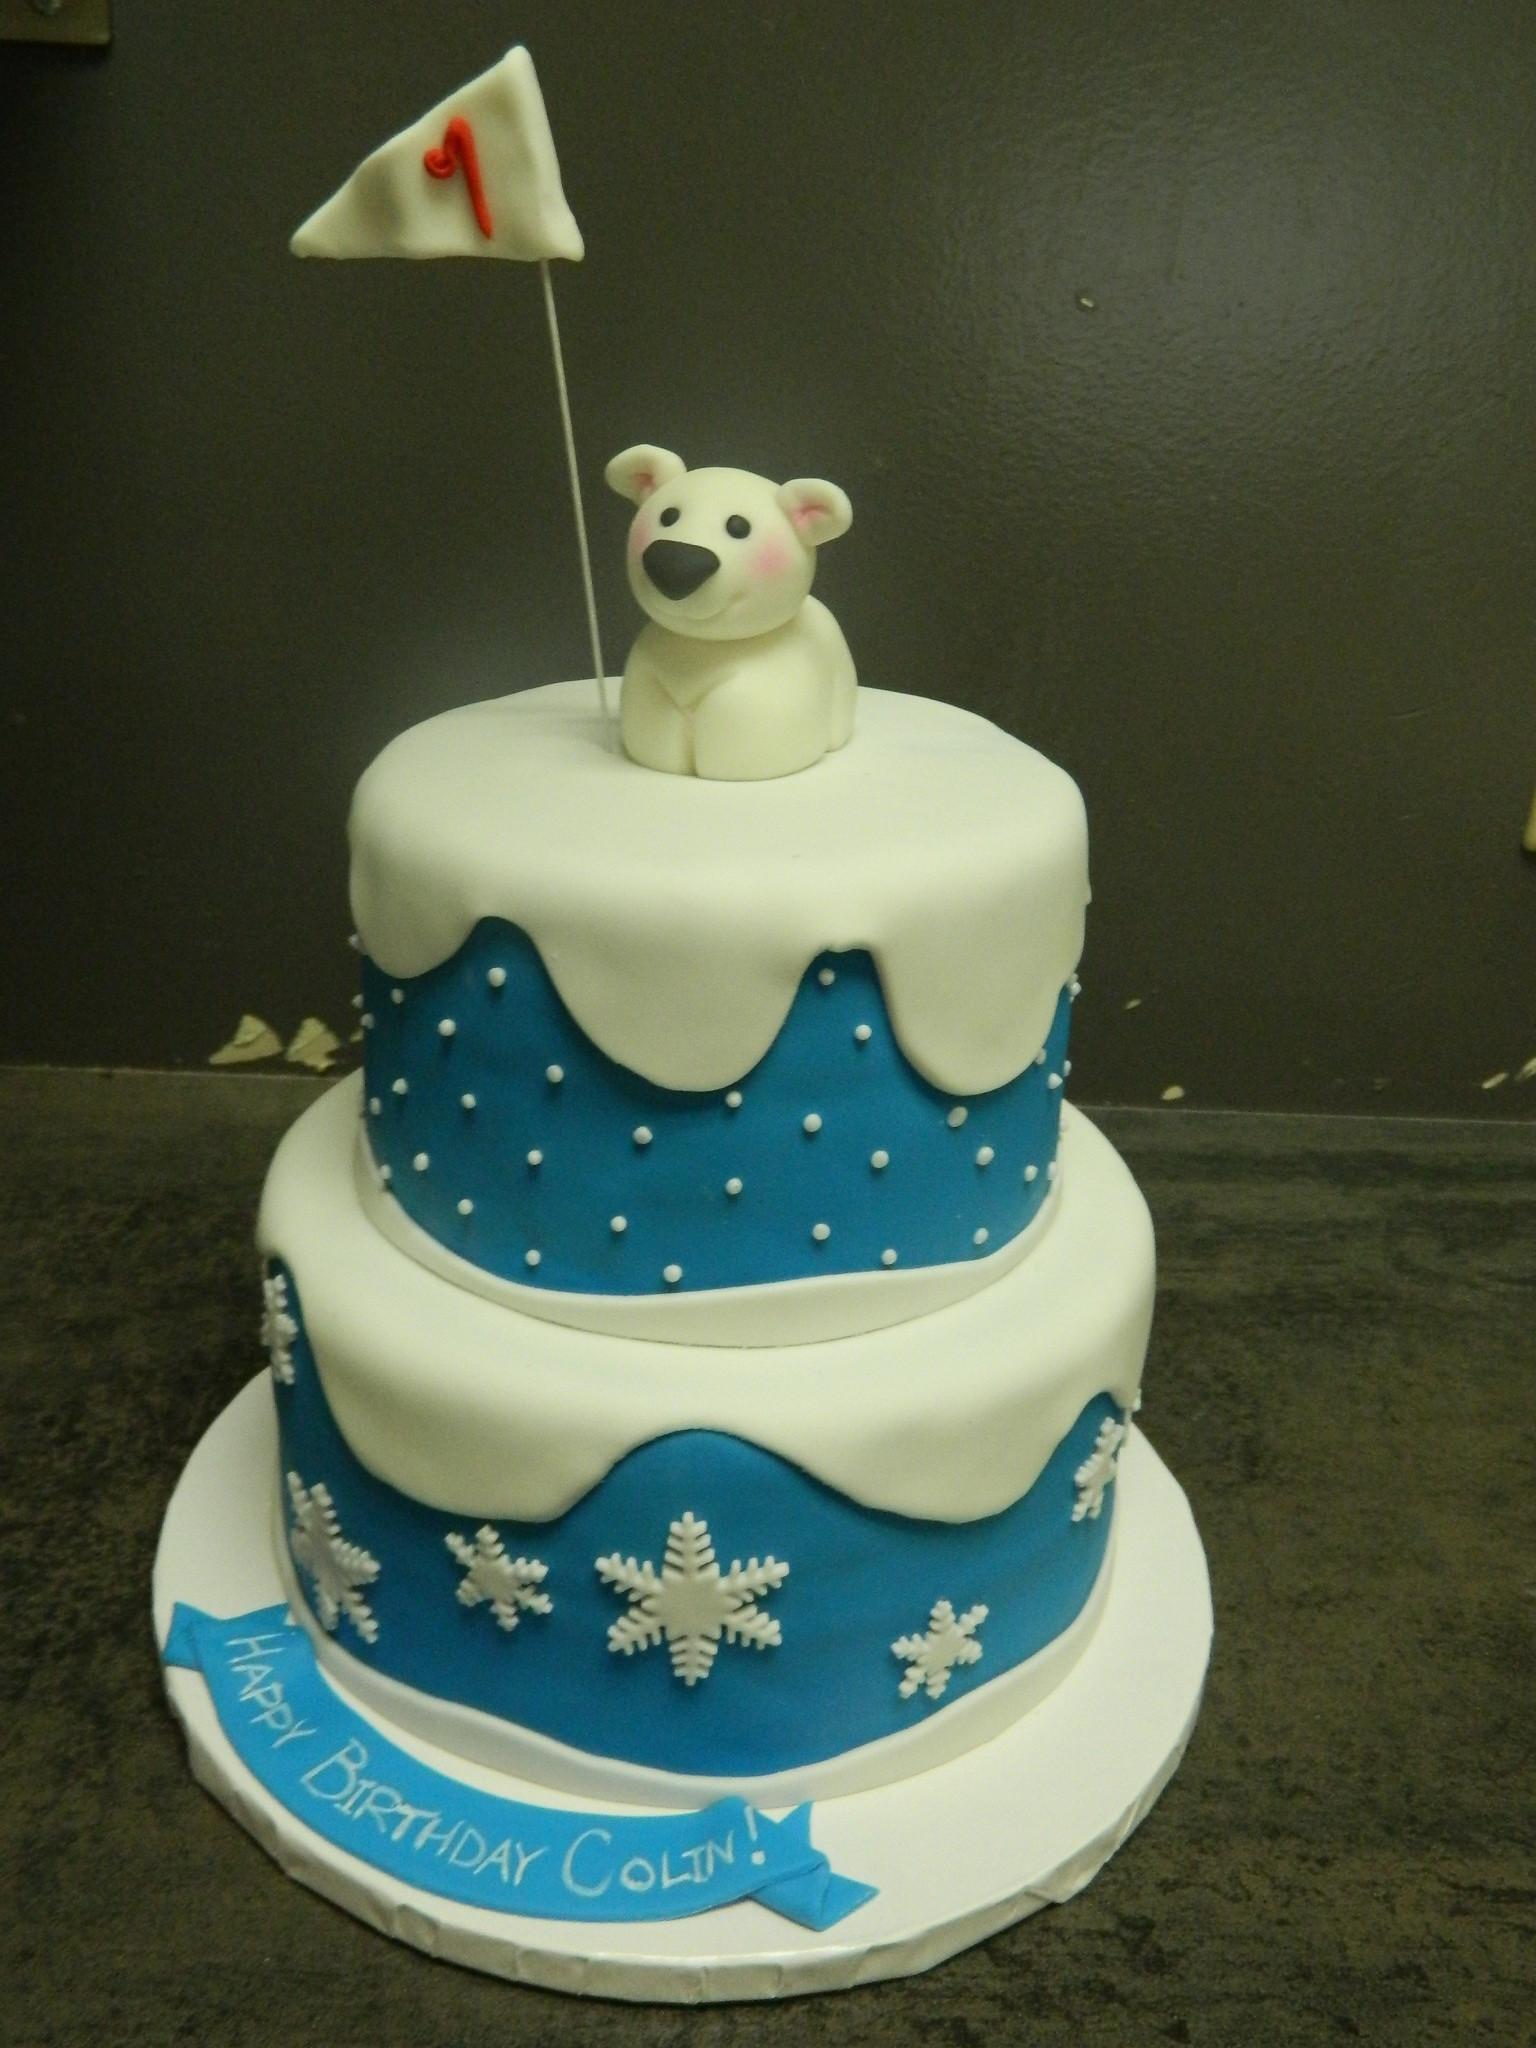 Best ideas about Image Birthday Cake . Save or Pin Custom Cakes Hey Cupcake London tario Now.